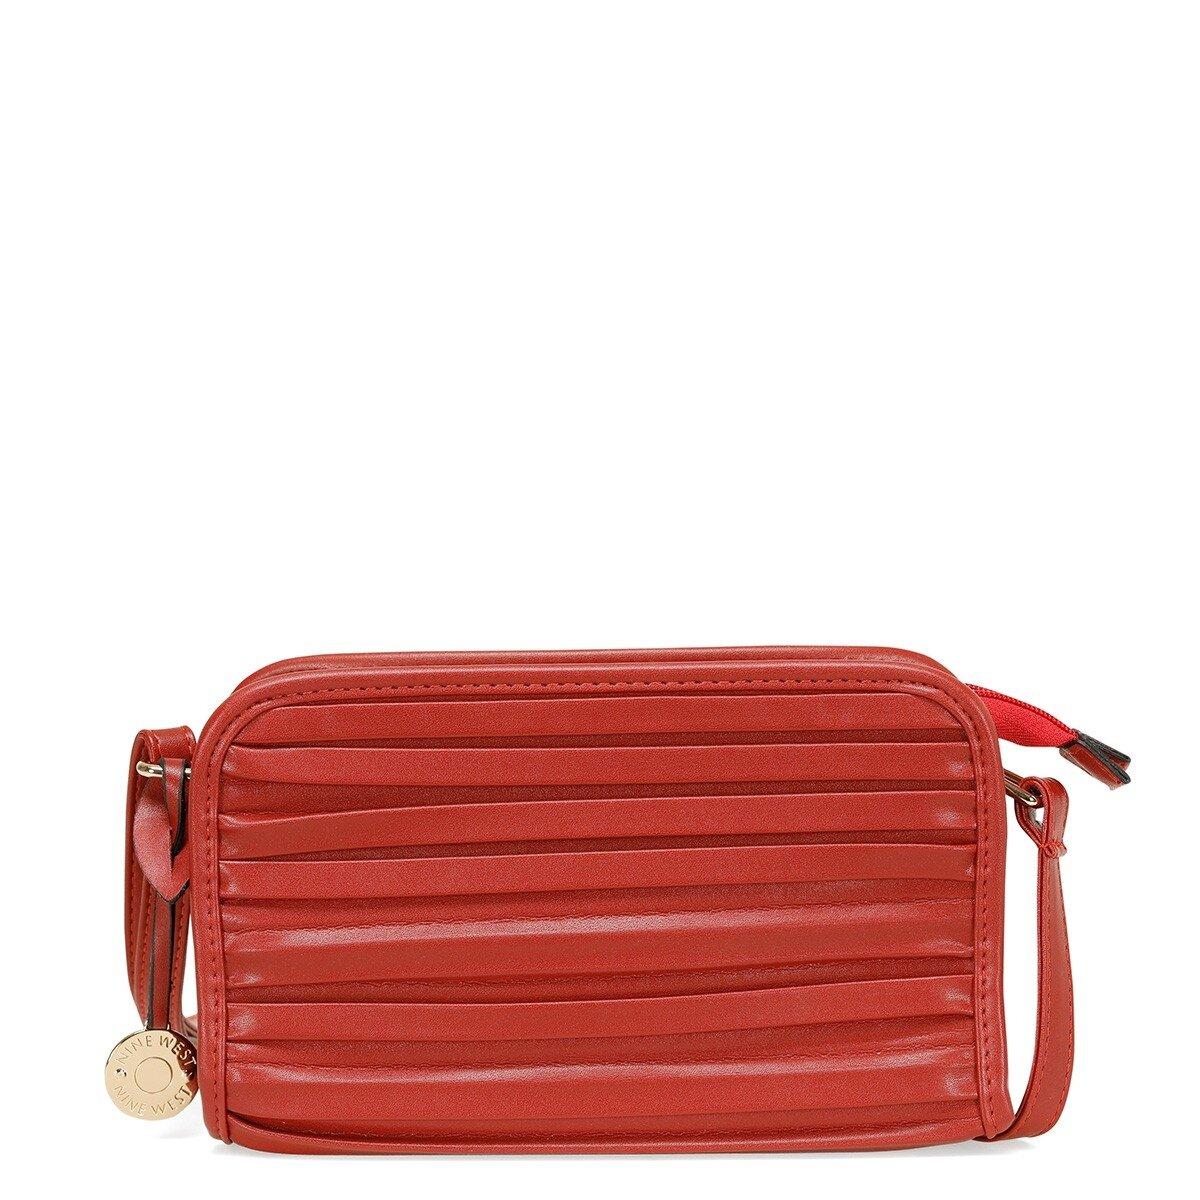 MINEL 1 FX Kırmızı Kadın Çapraz Çanta